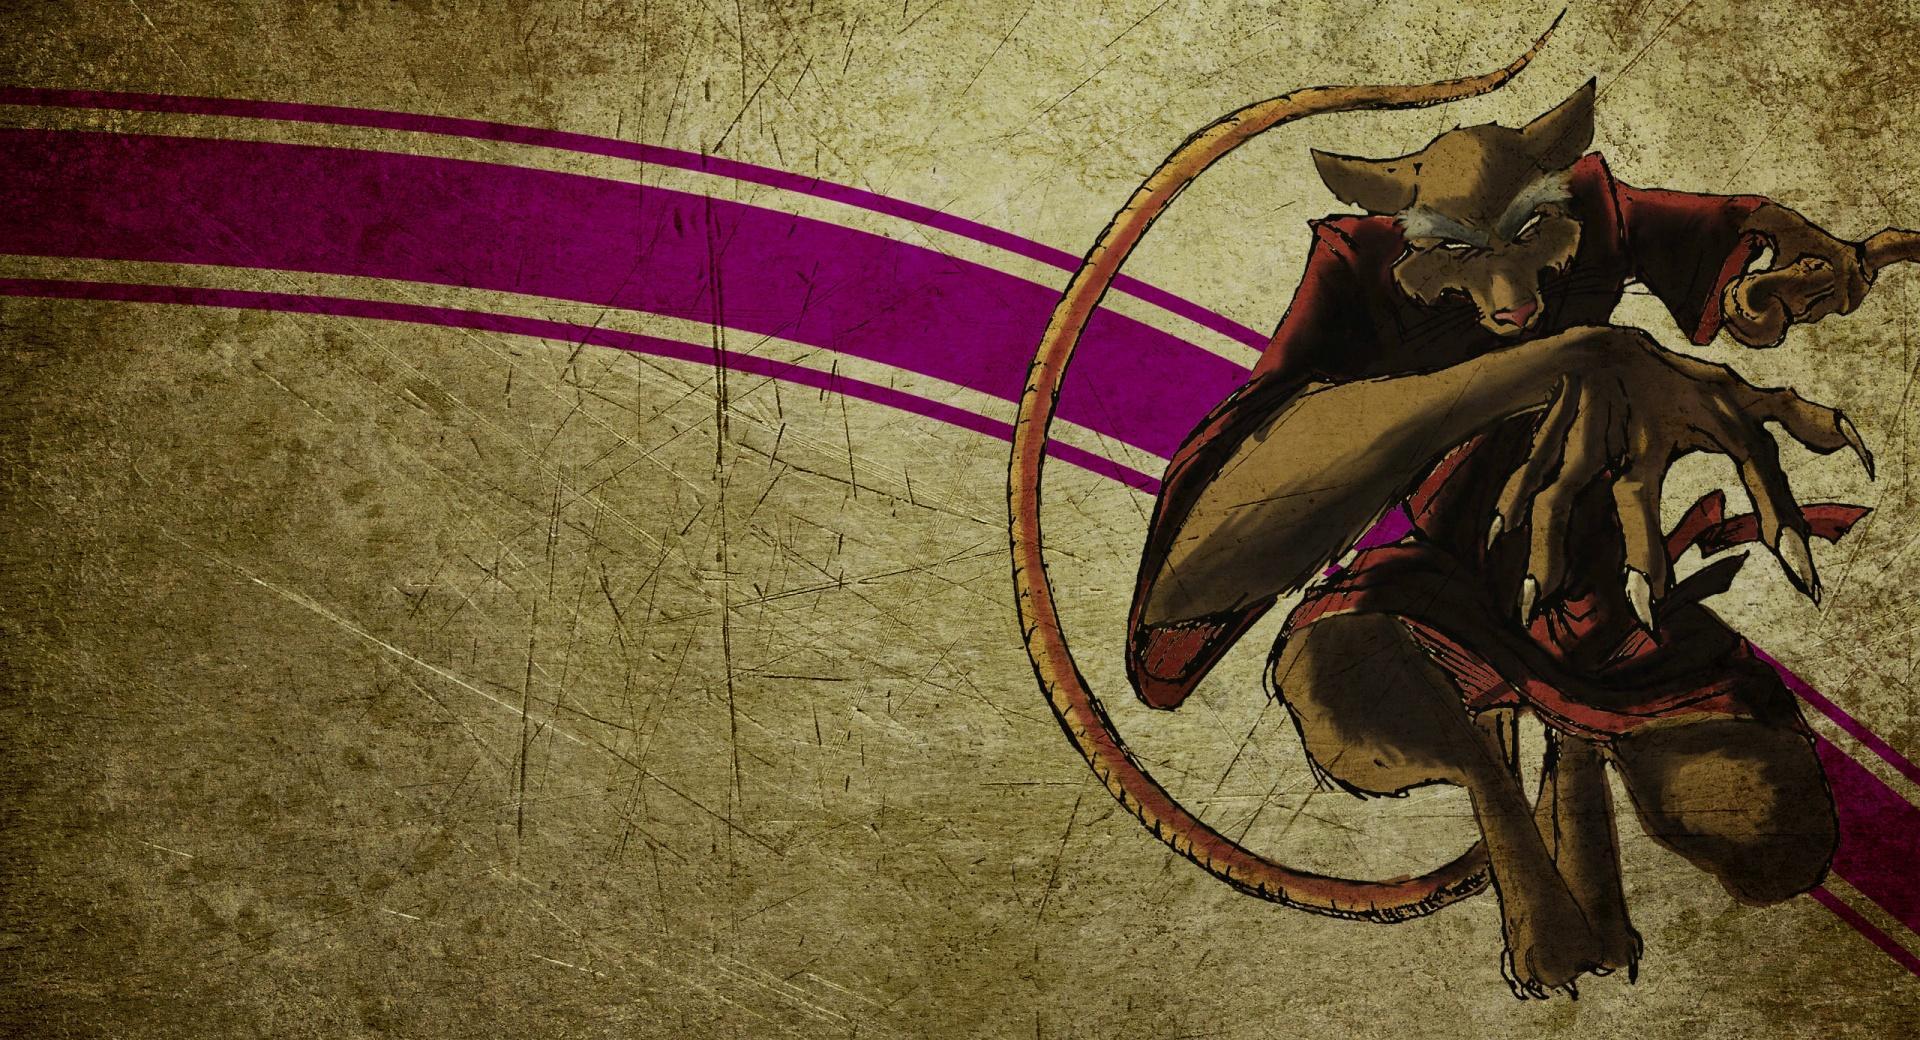 Splinter  Teenage Mutant Ninja Turtles wallpapers HD quality